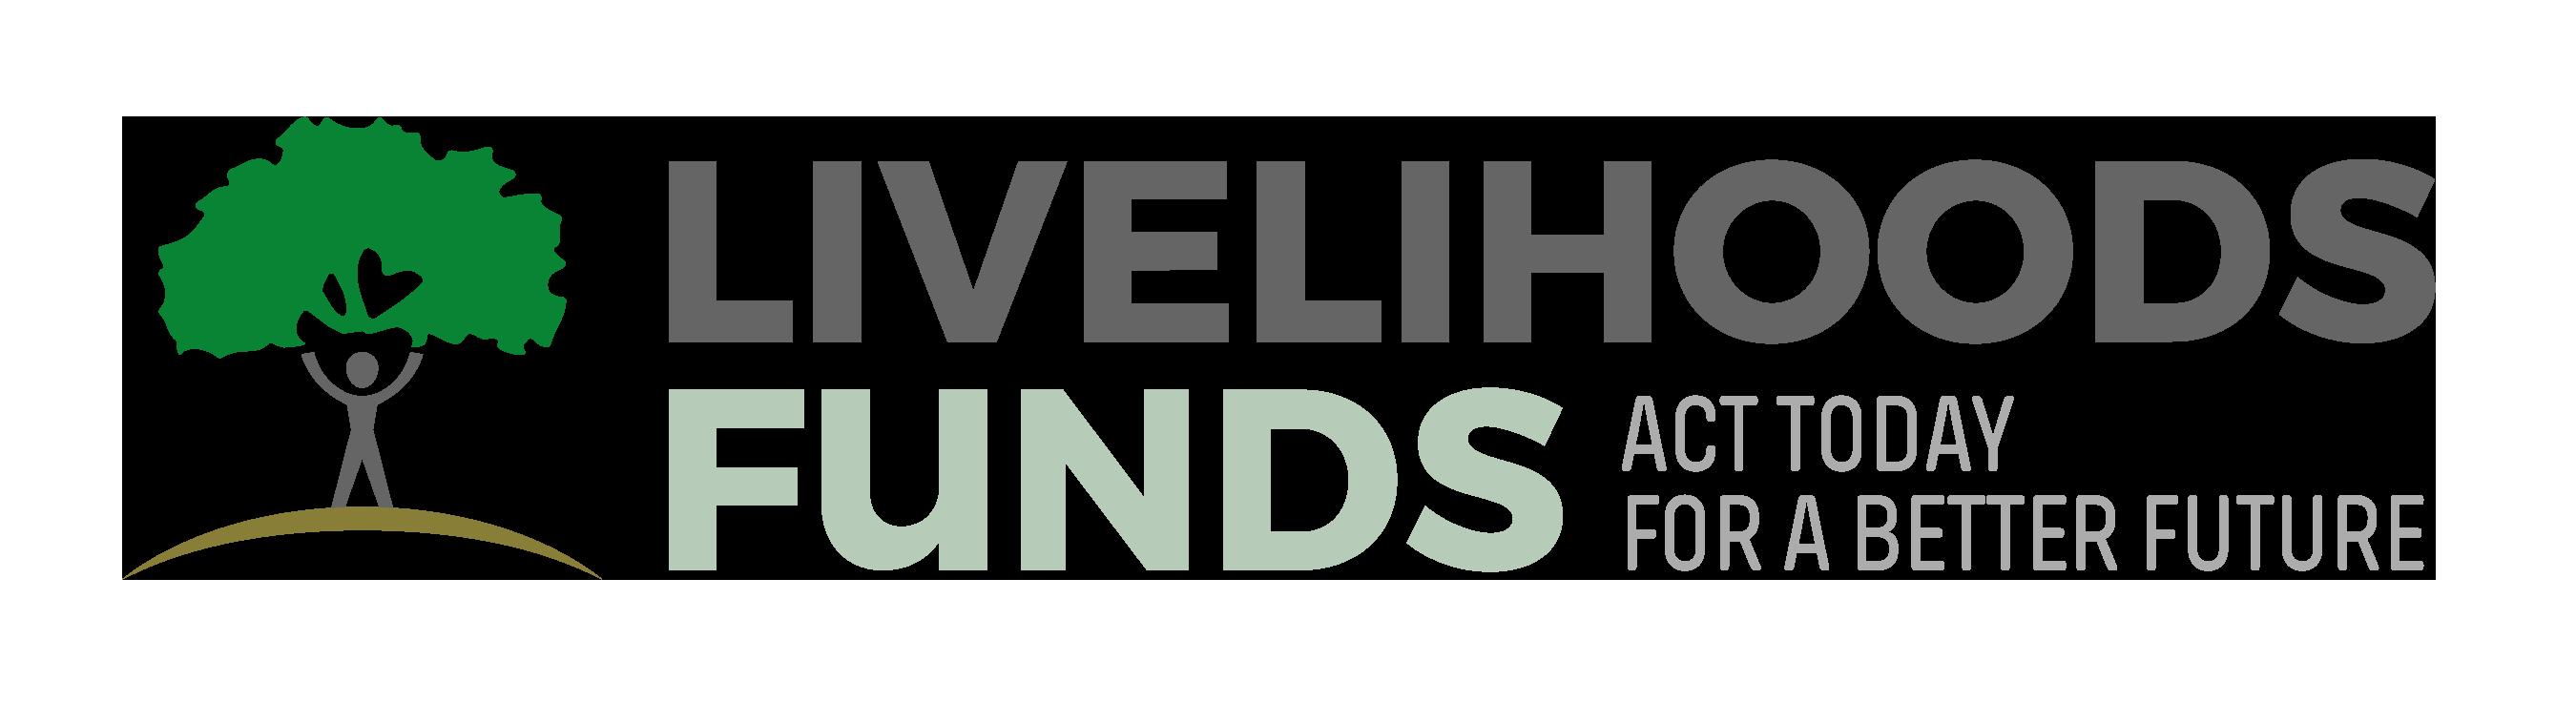 Livelihoods Funds